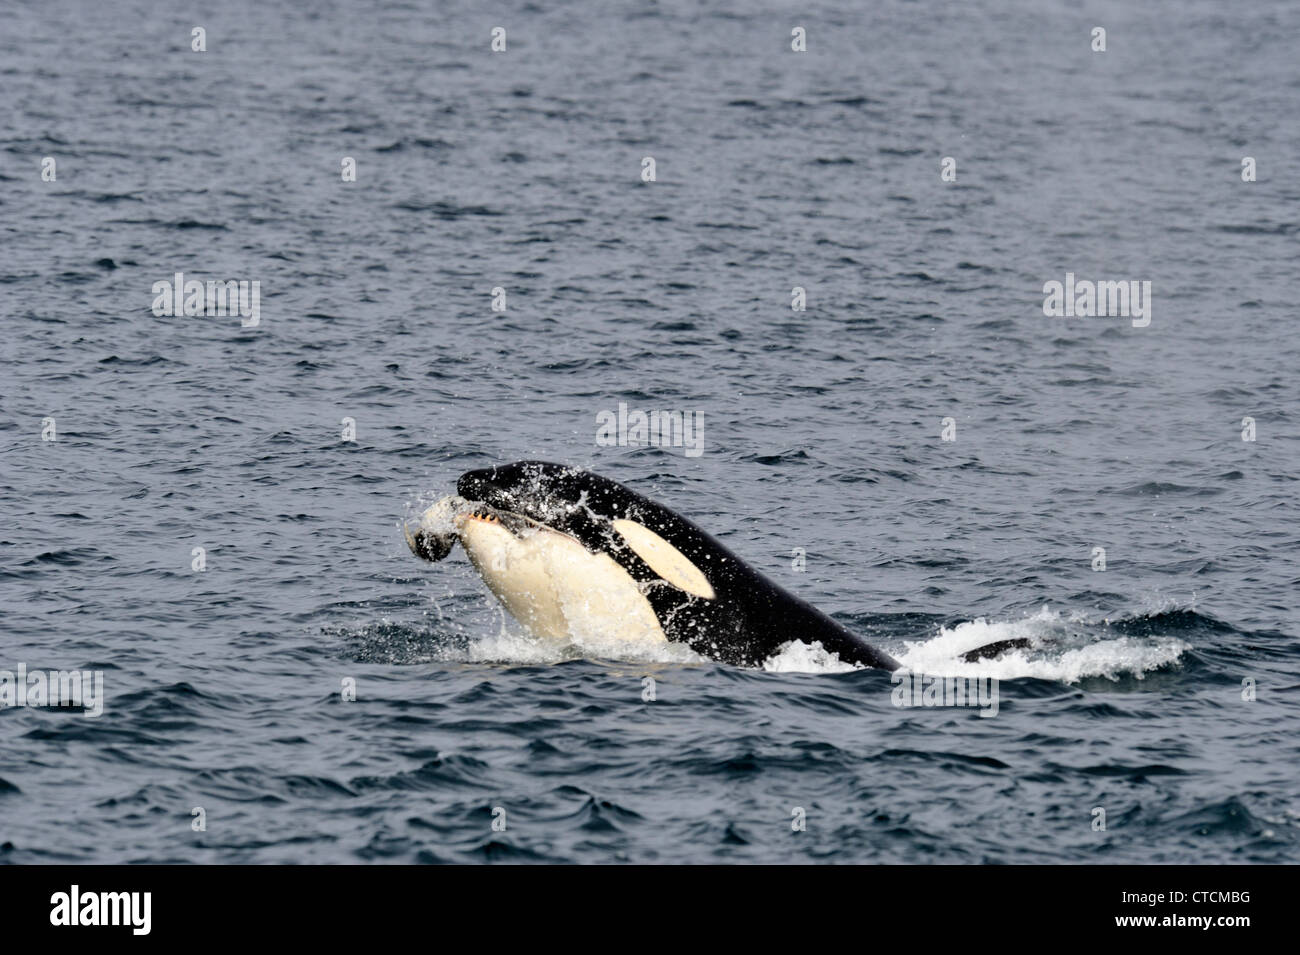 Killer whale (Orcinus orca) Spy-hopping Transient pod summer harbor seal feeding prey Johnstone Strait, Vancouver - Stock Image